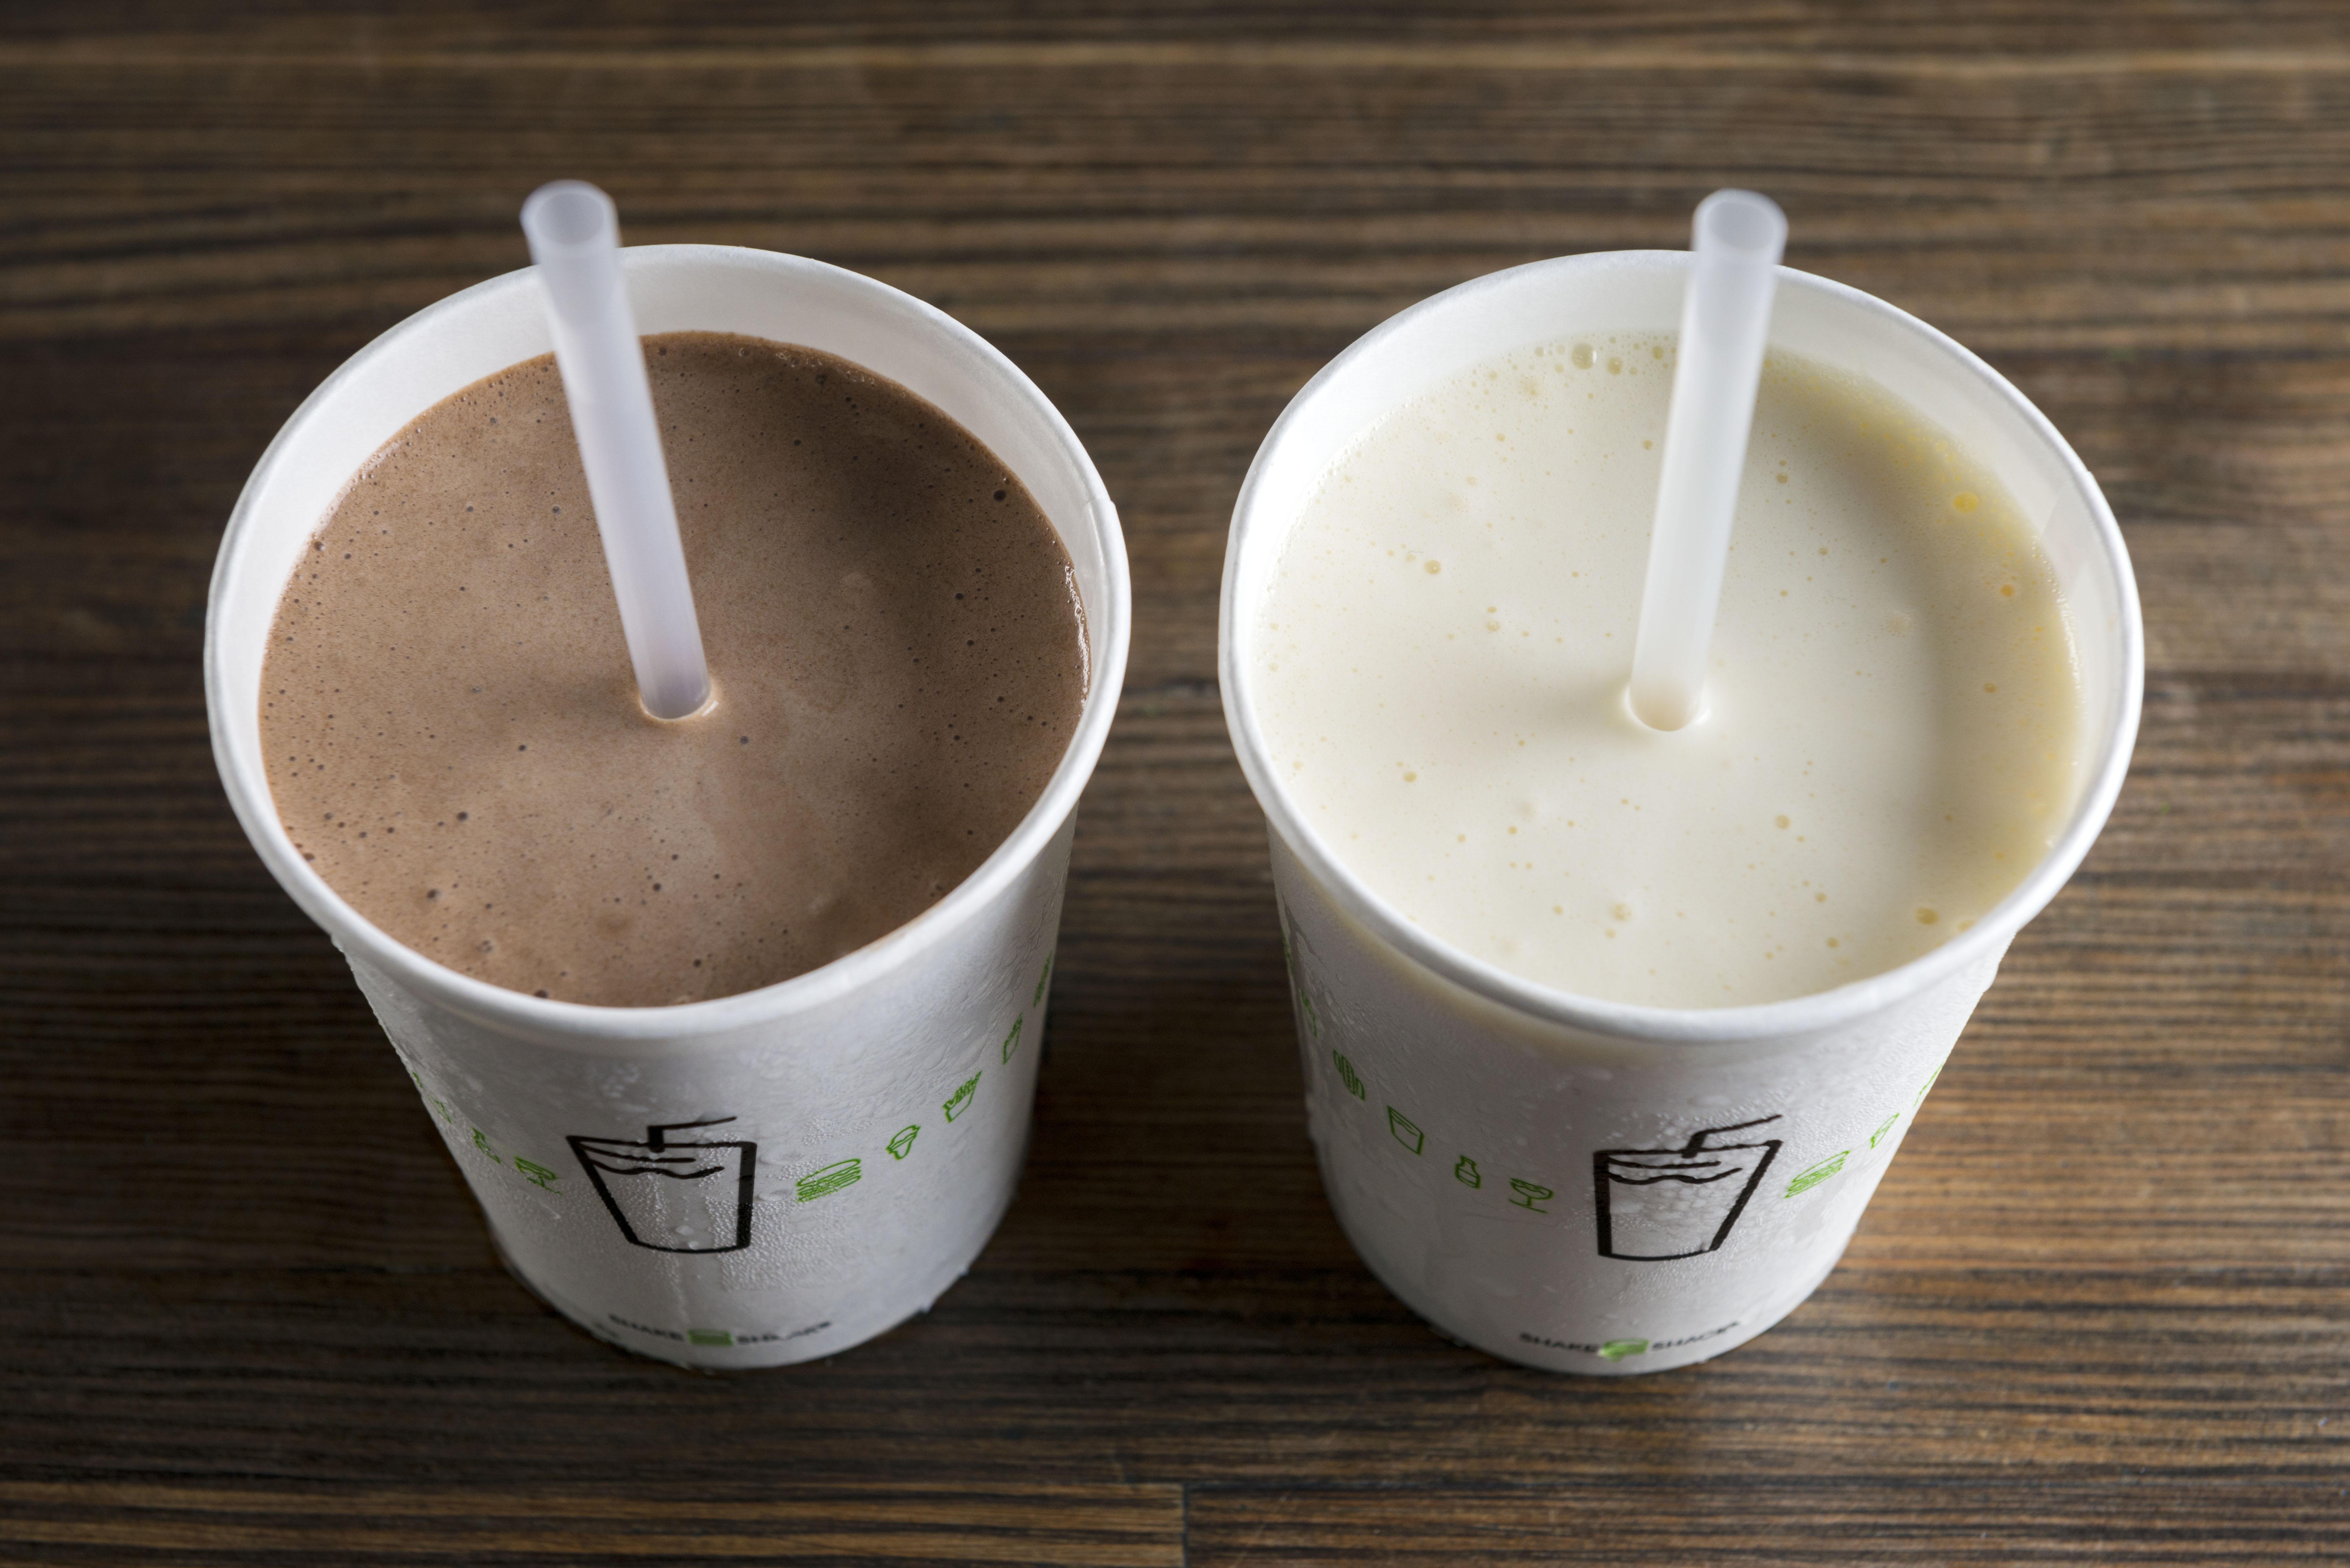 Two shake shack milkshakes with plastic straws